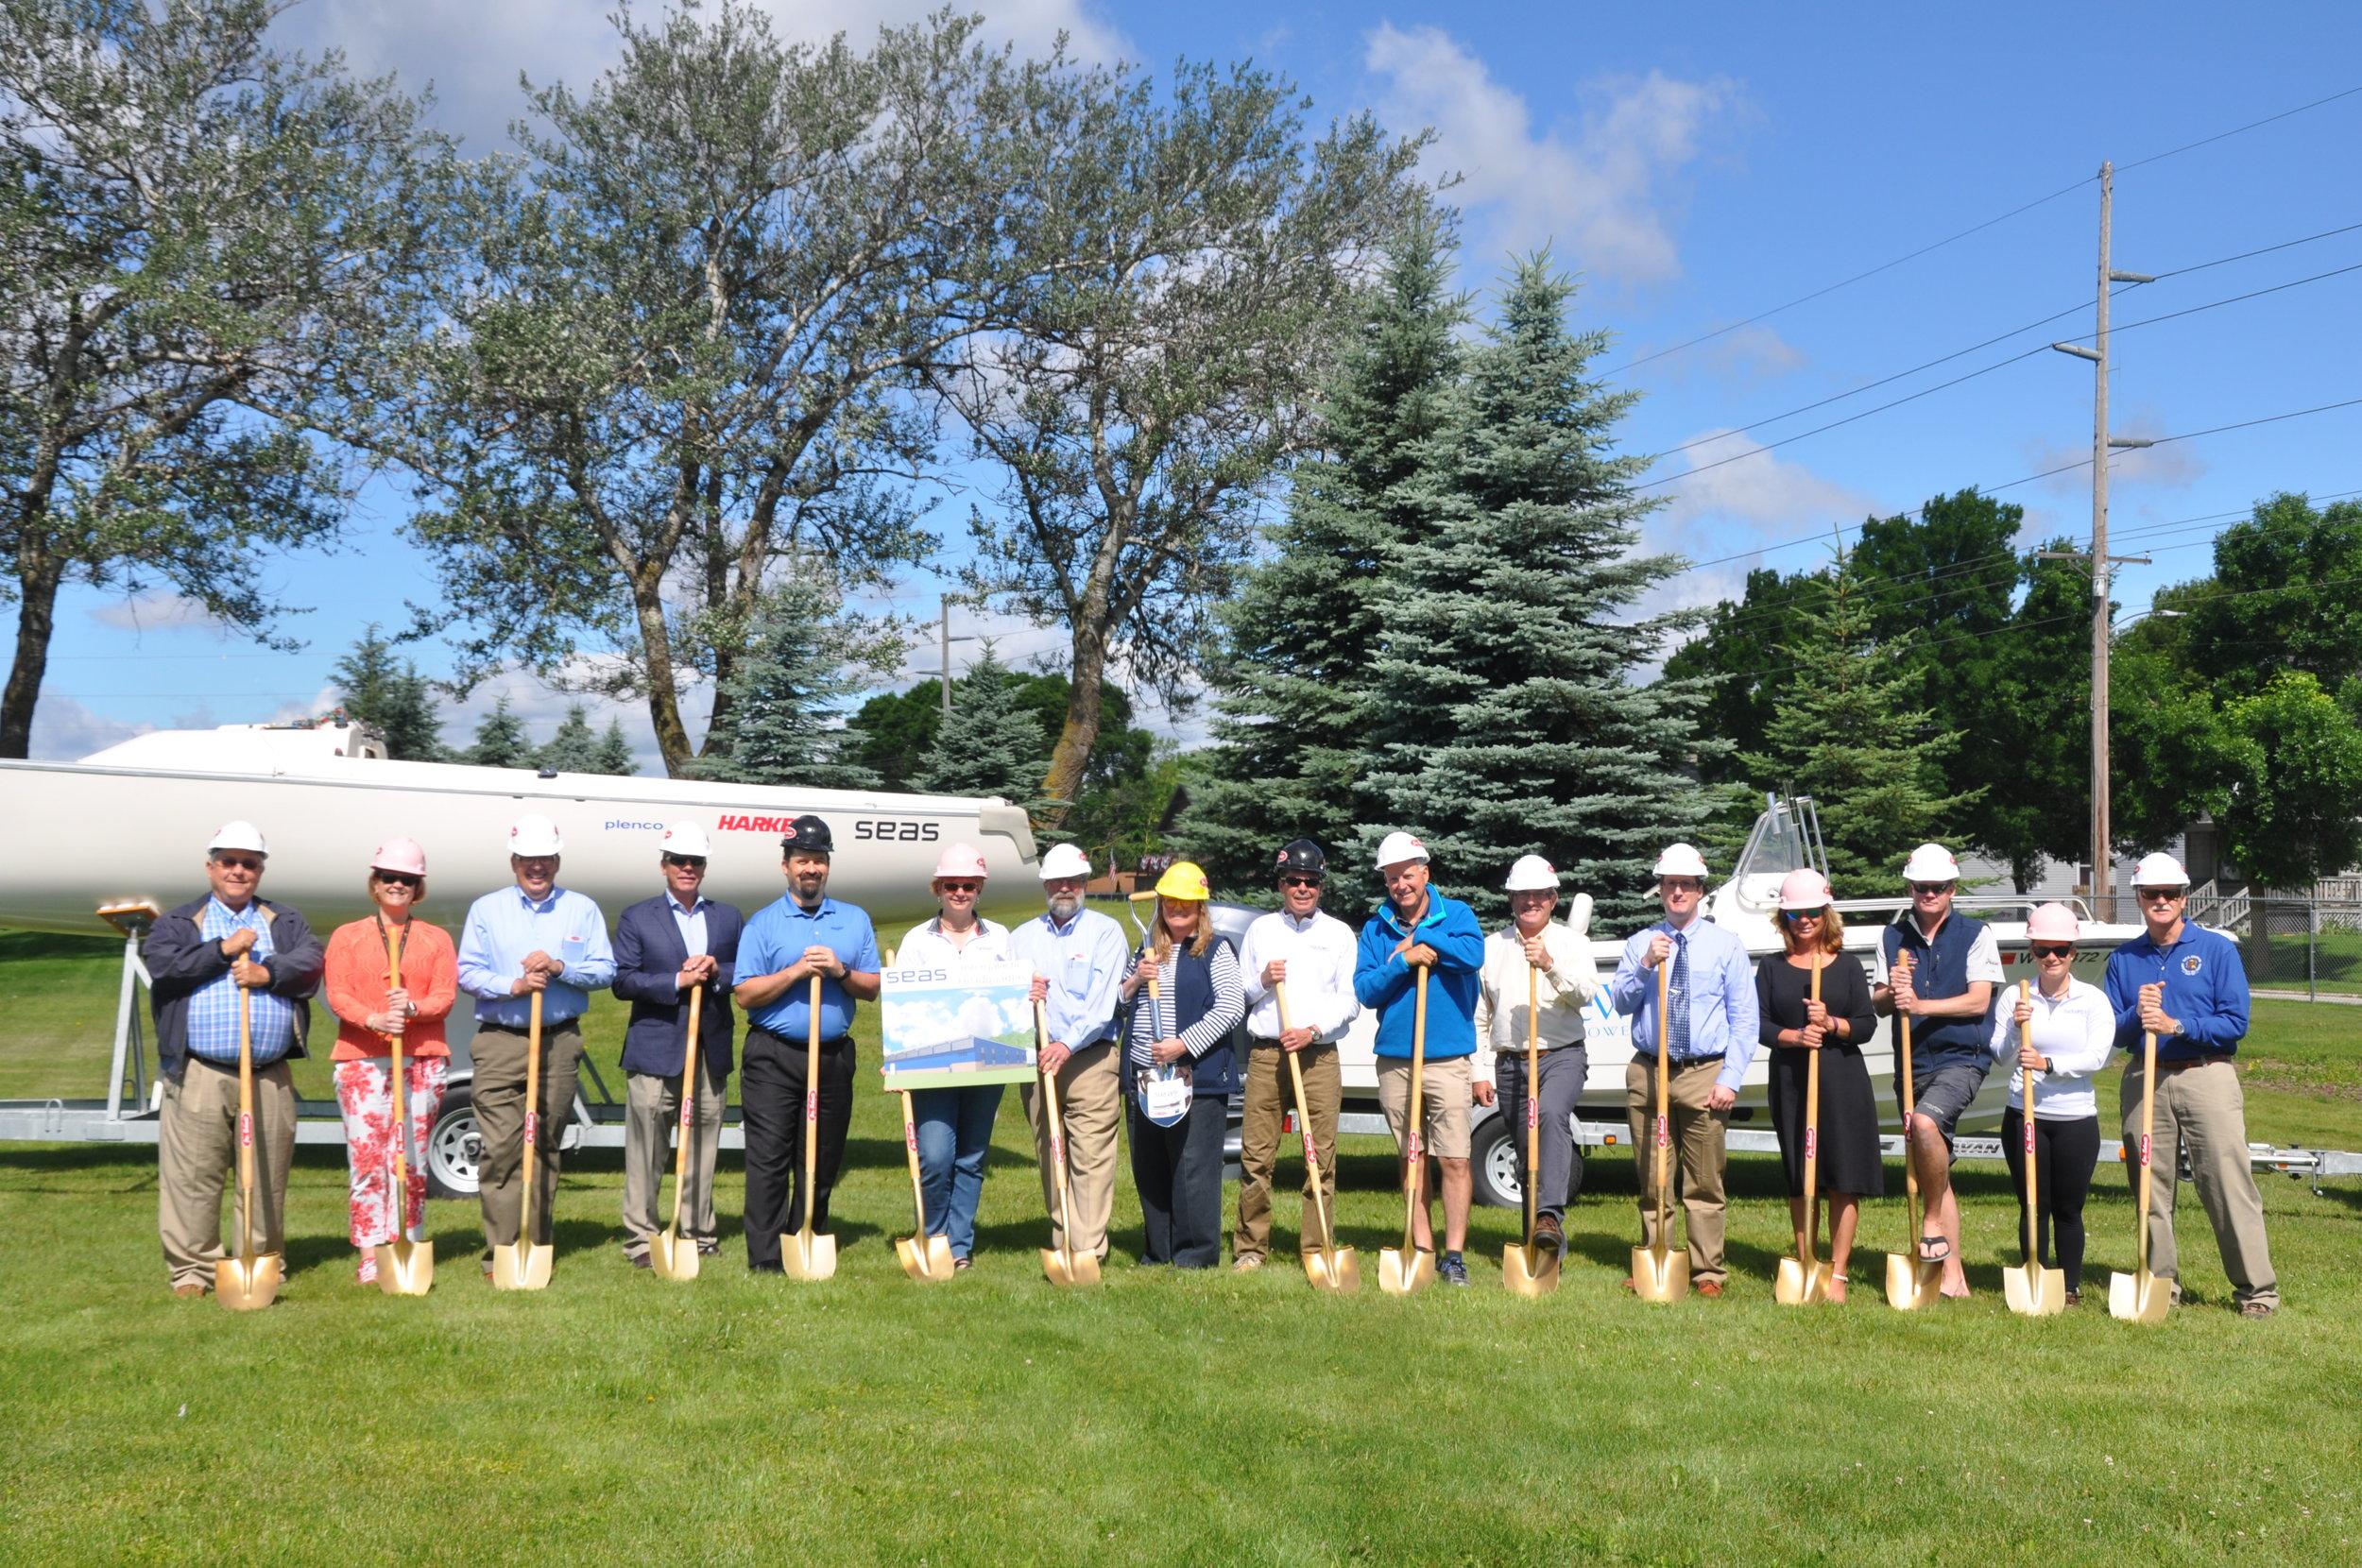 SEAS chairman, Leslie Kohler, staff, board members, The Vollrath Co., LLC representative, Jos. Schmitt Construction and LJM Architects break ground on 6/27/17.